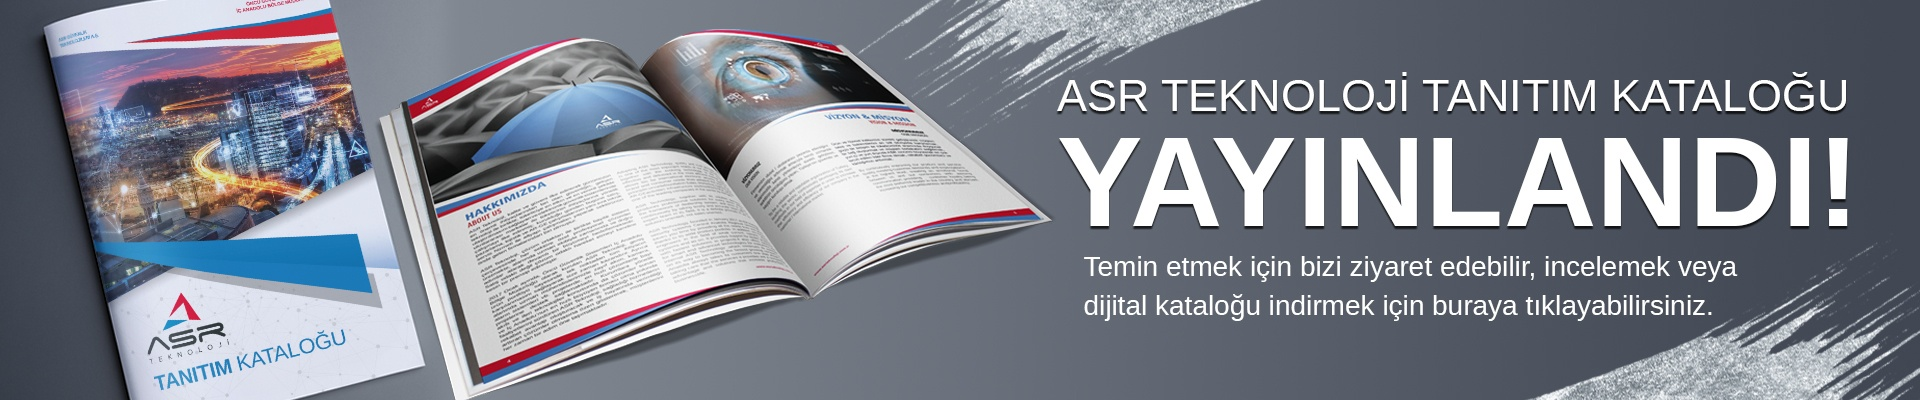 ASR Teknoloji Tanıtım Kataloğu